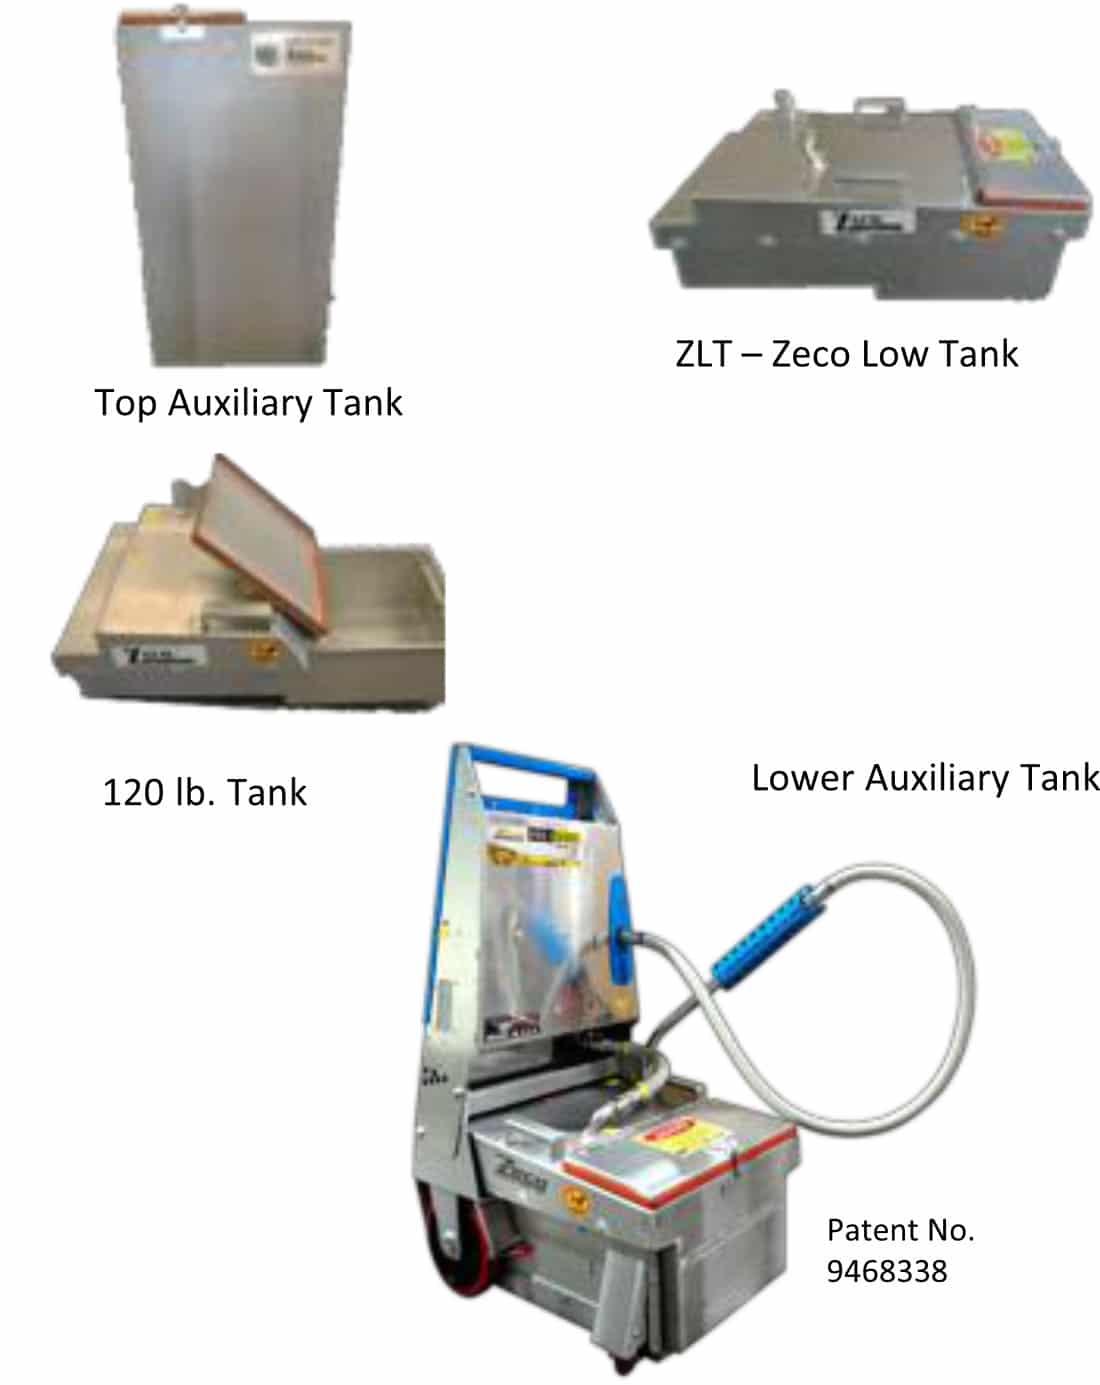 Bulk Oil Systems Zeco Modular Design Photo 1